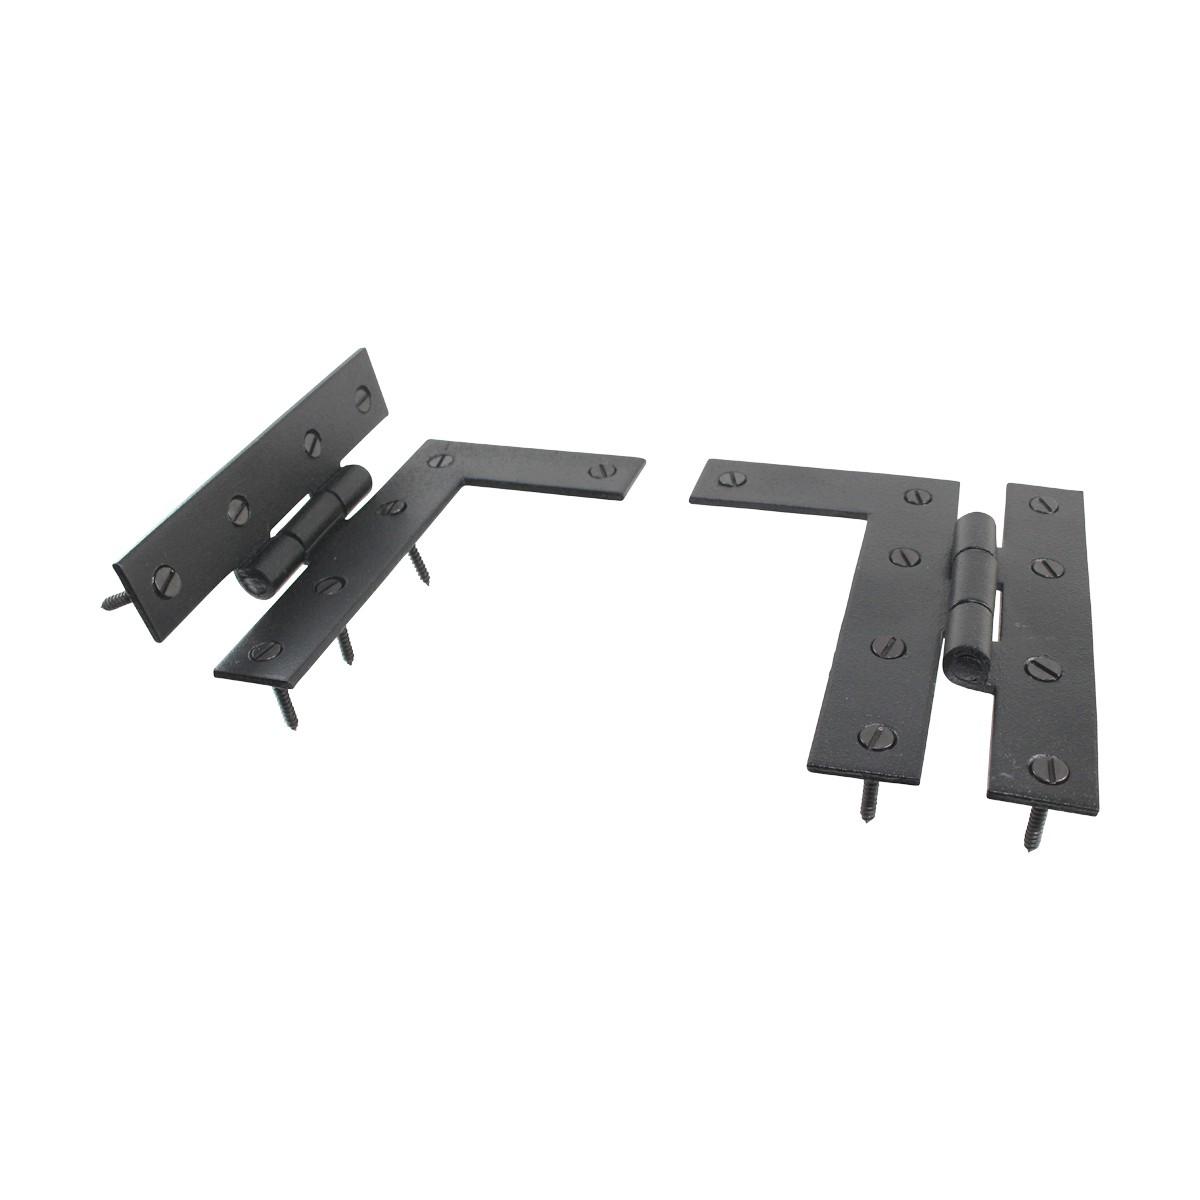 Pair Flush HL Cabinet Hinge Wrought Iron 4.5H Wrought Iron Door Hinges Black Door Hinges Rustproof Cabinet Hinges